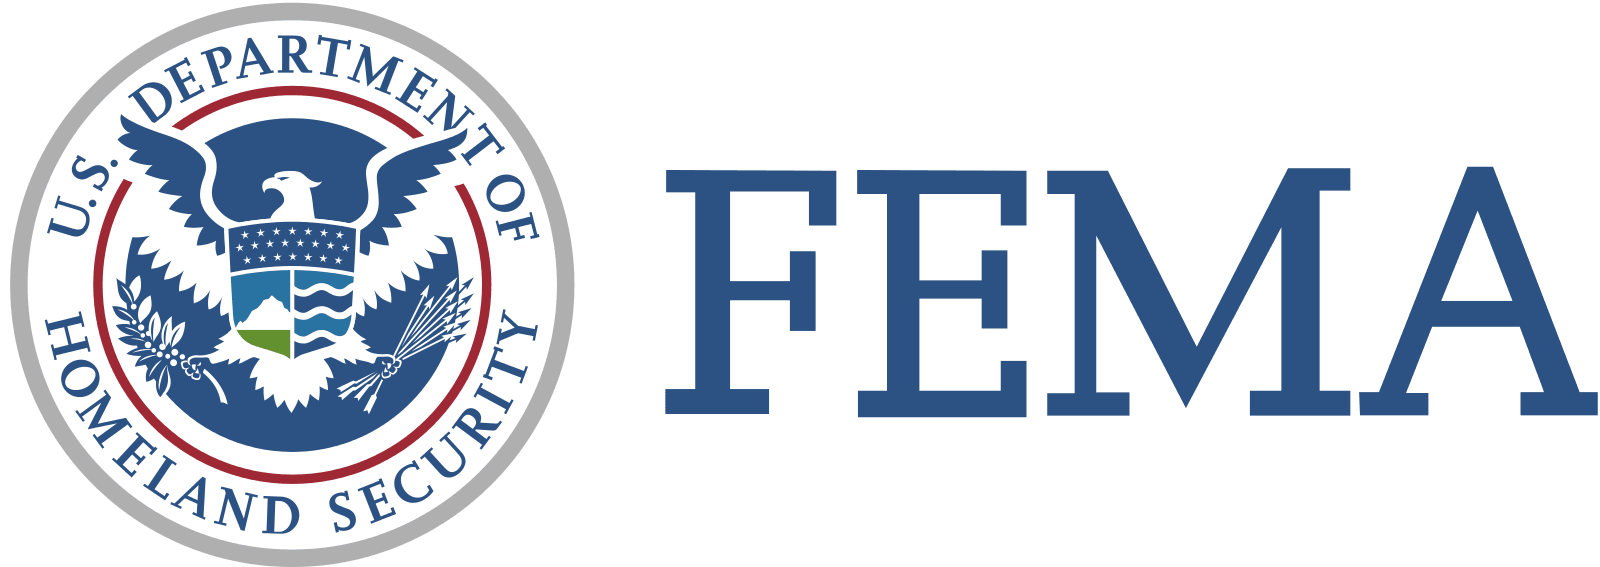 do-fema-buy-outs-favor-white-neighborhoods-morning-edition